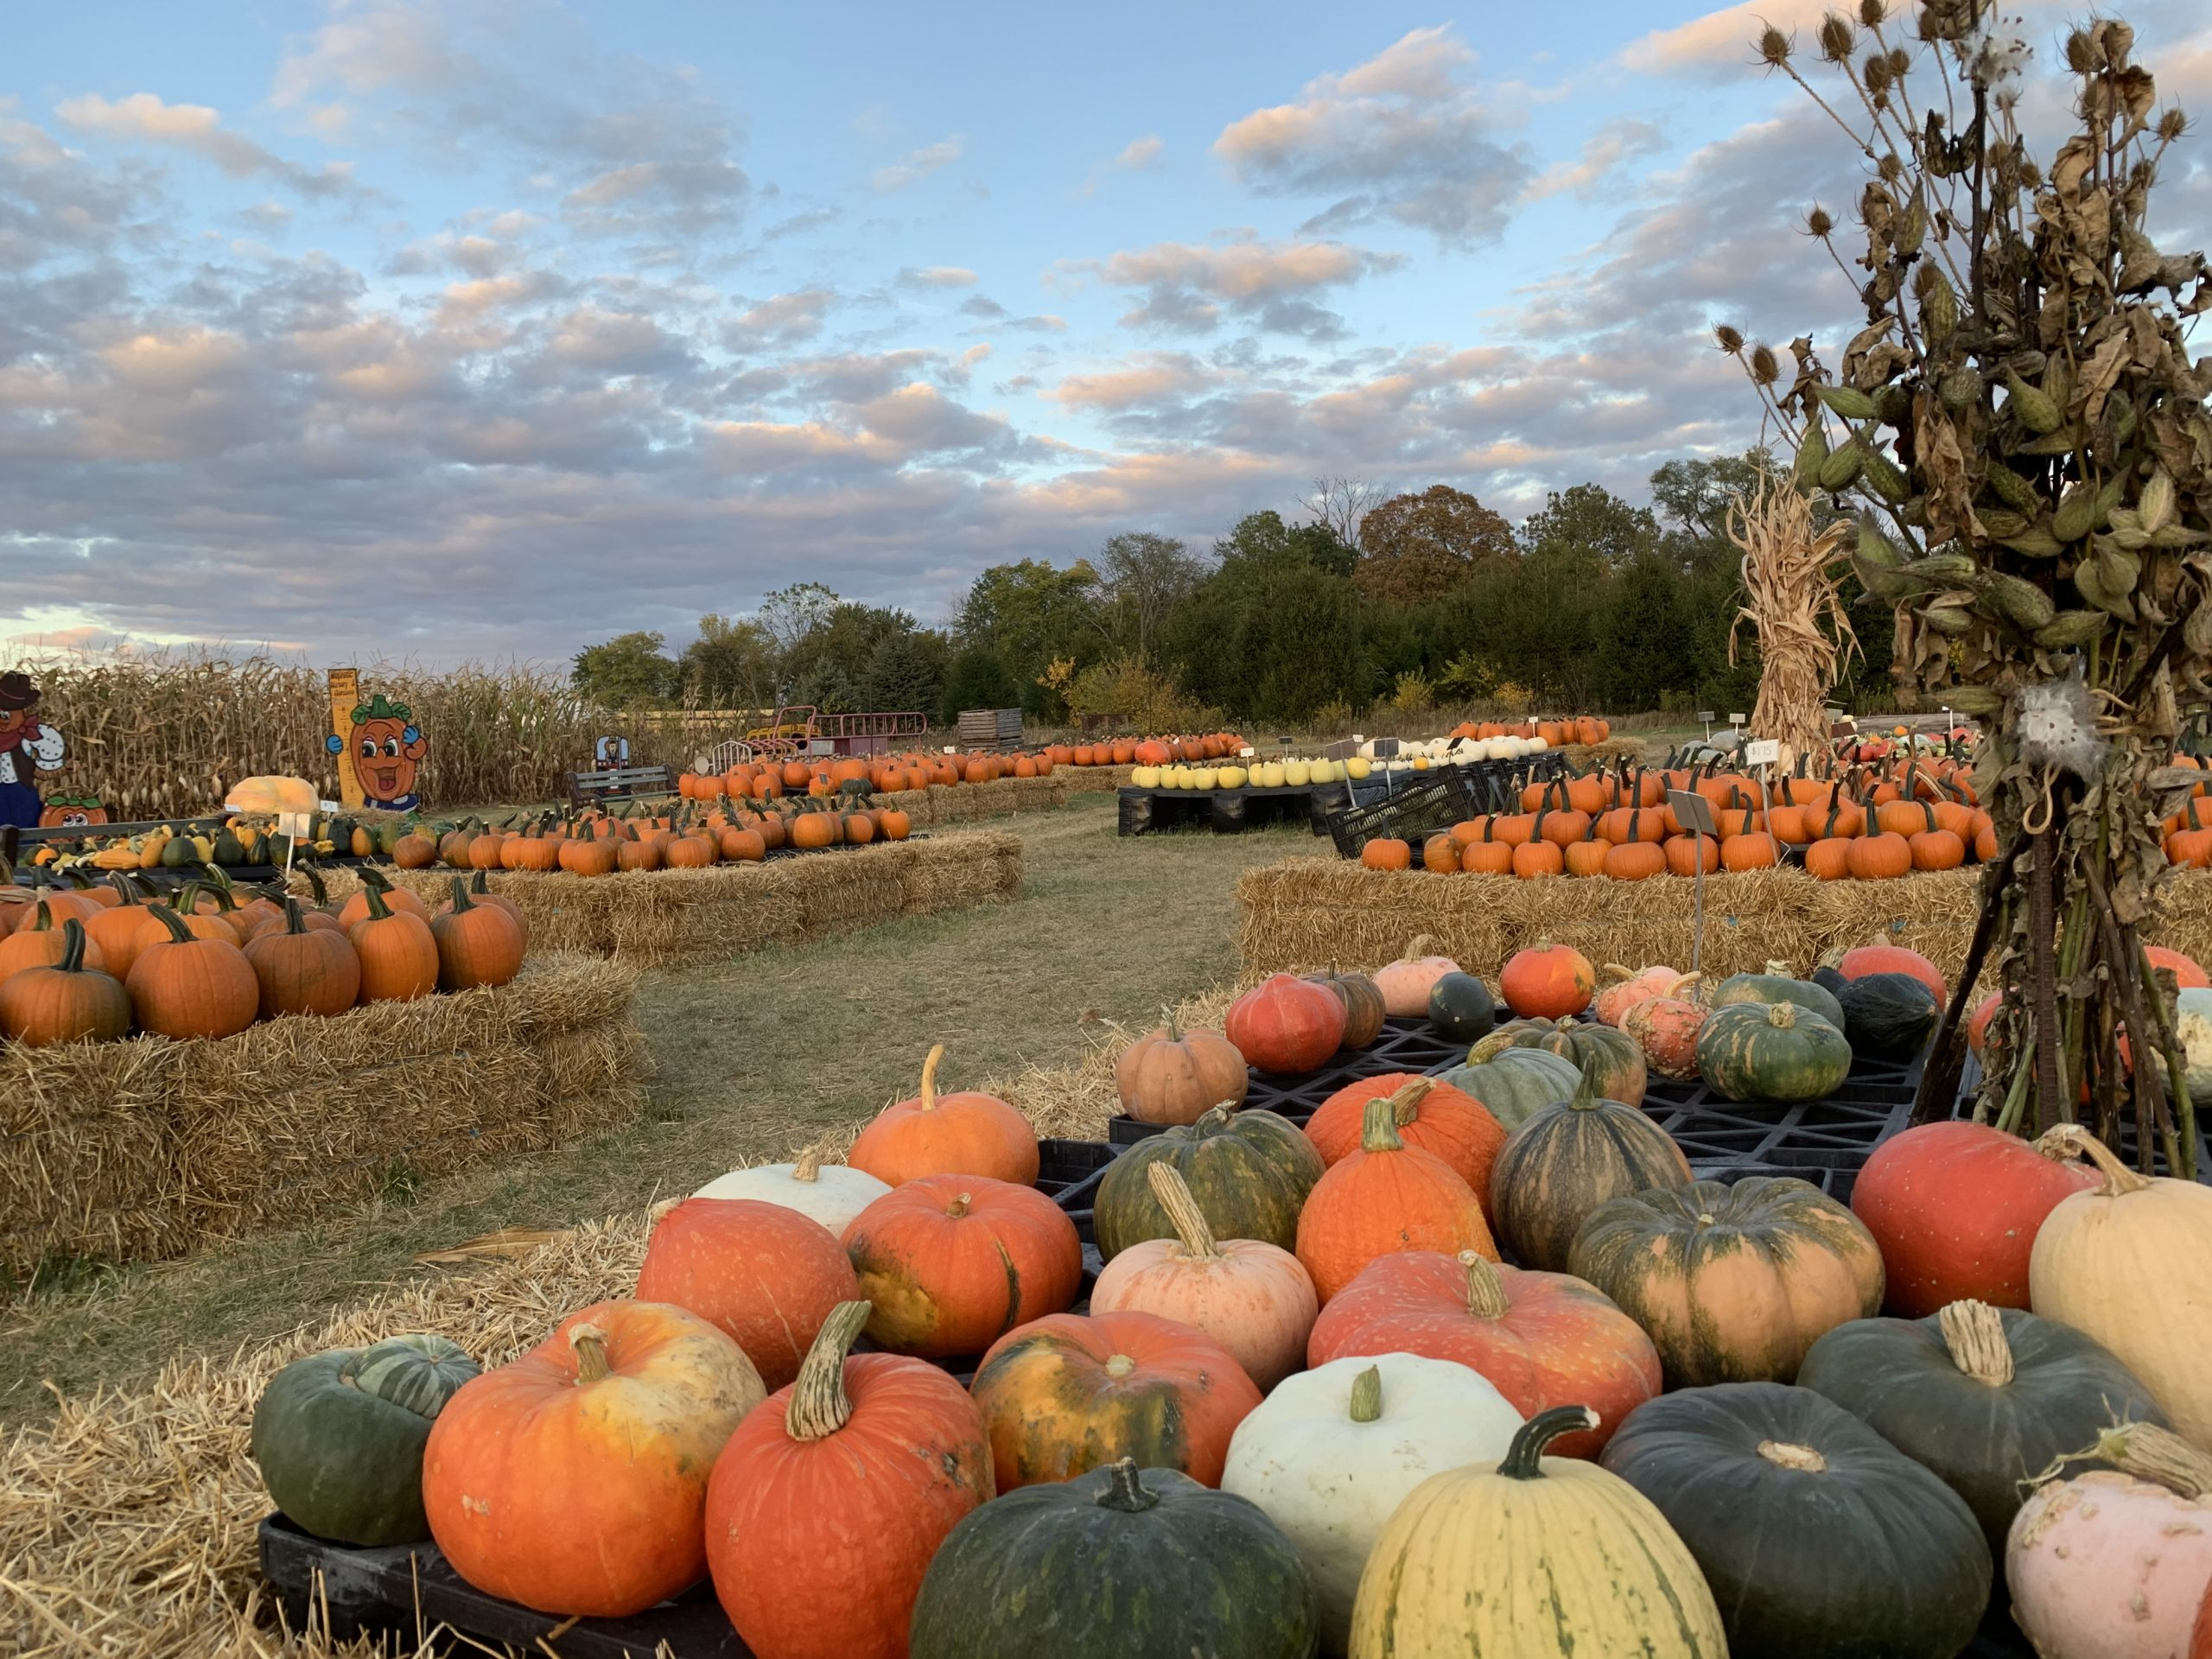 Pumpkins Majestic Nursery & Gardens